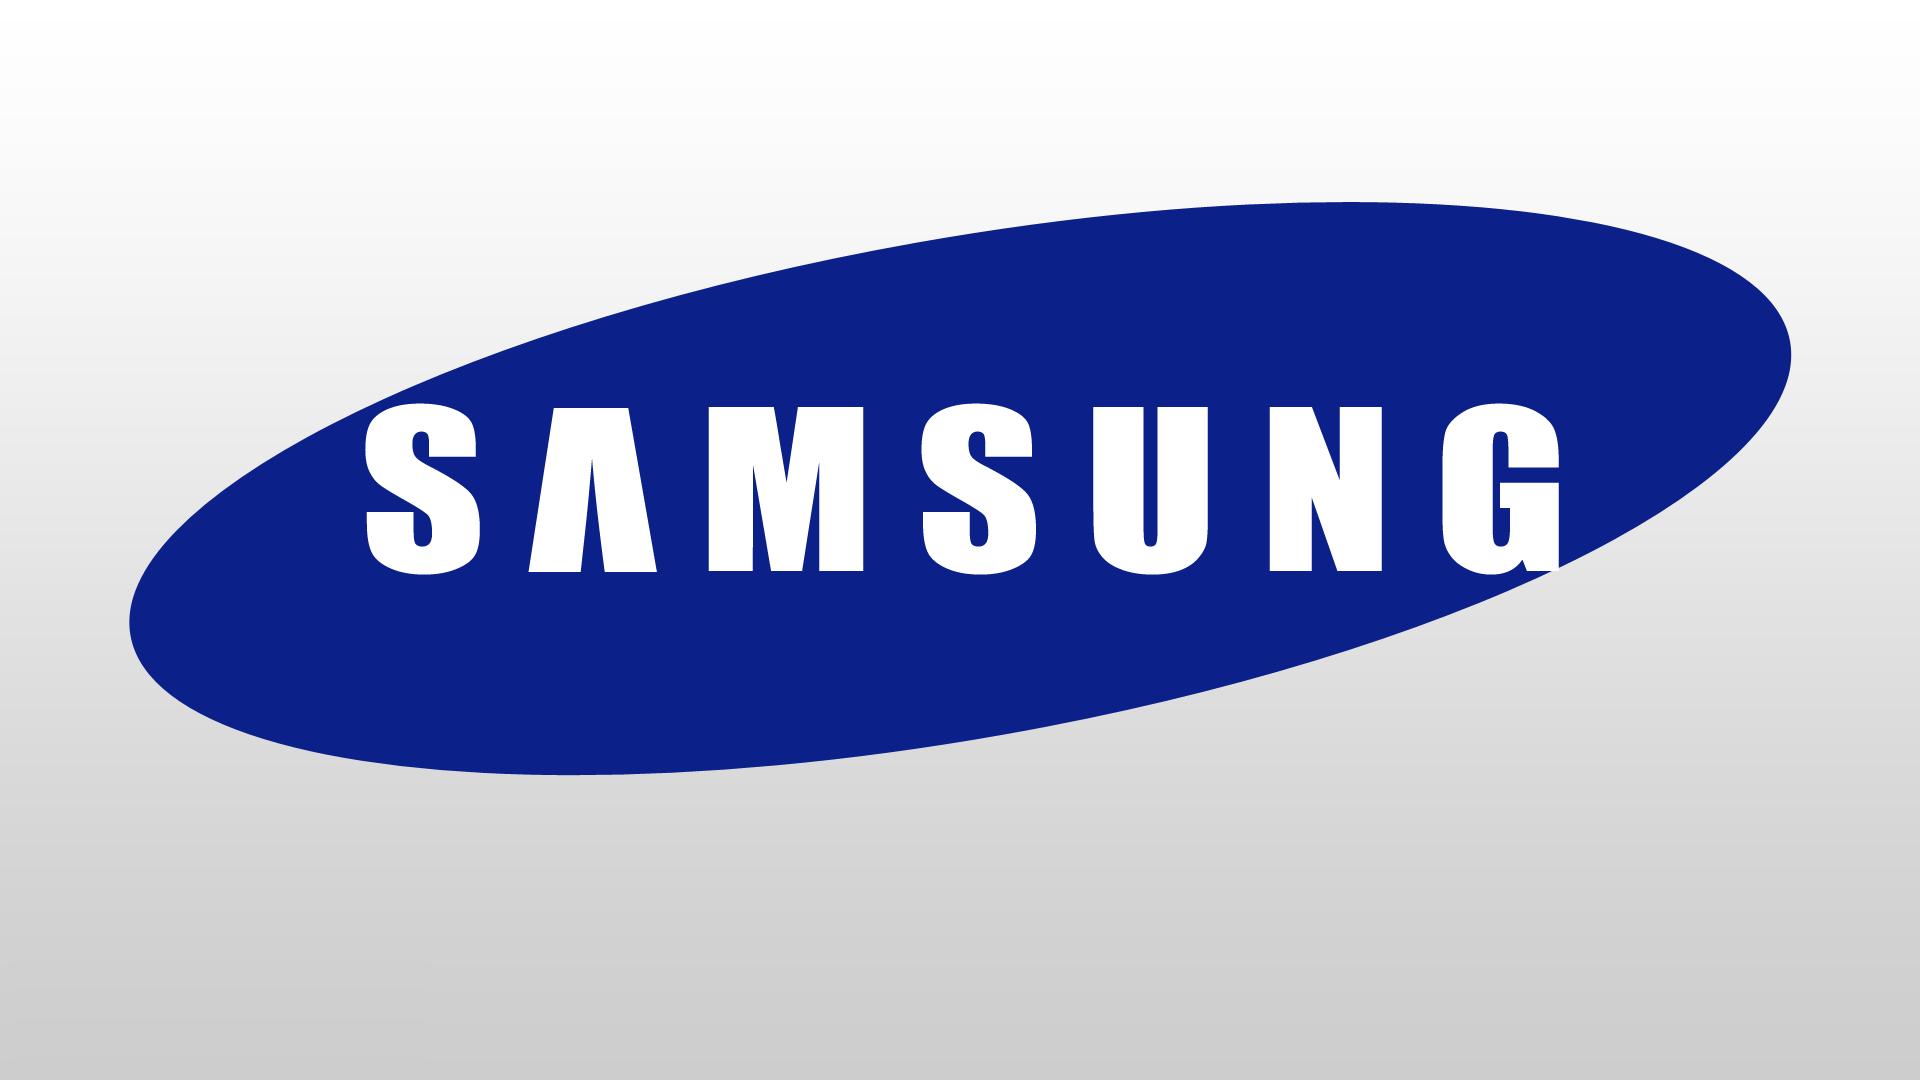 Samsung Logo Hd Wallpapers Funkykit